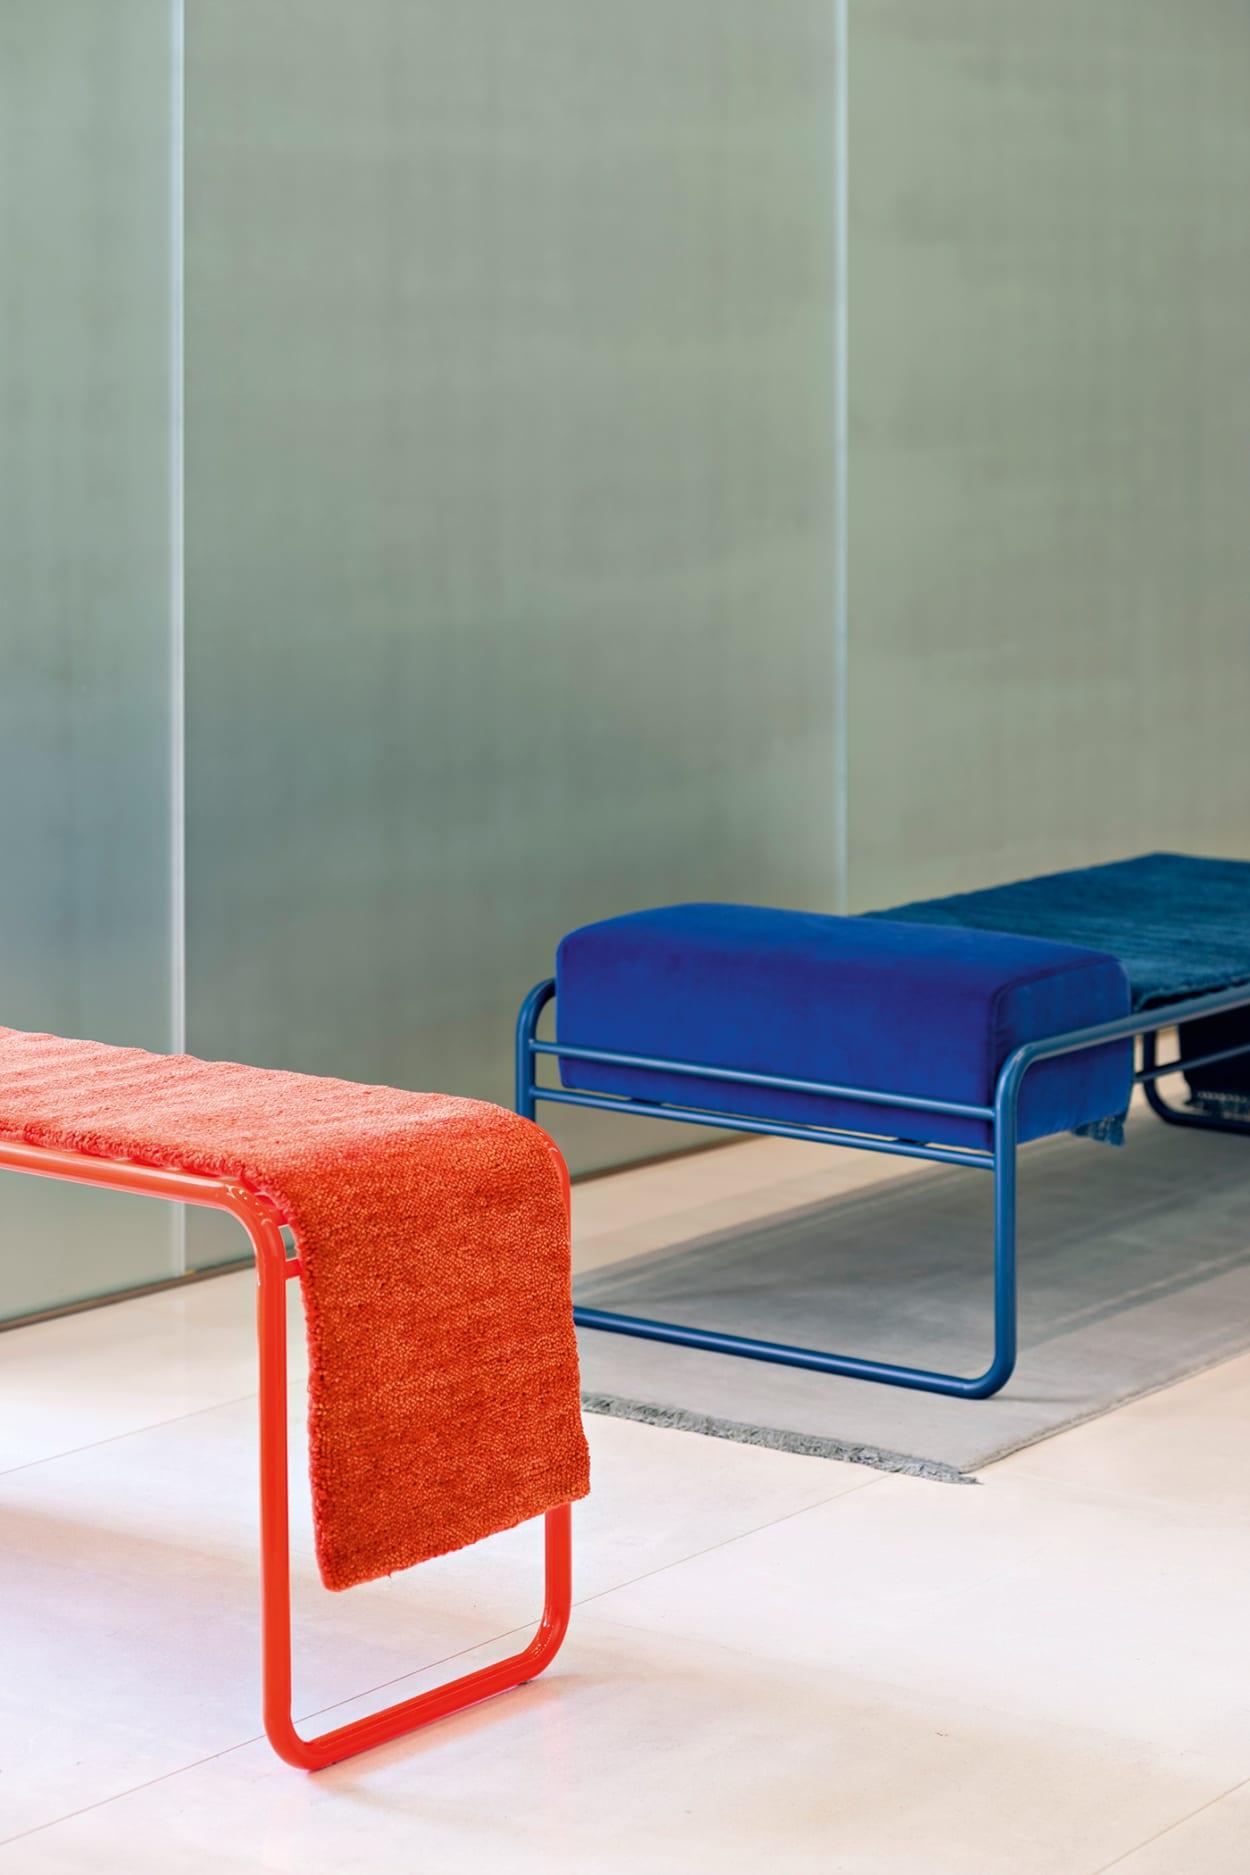 Katrin Greiling, Interiordesign, Structures, Klinnasand, Kvadrat